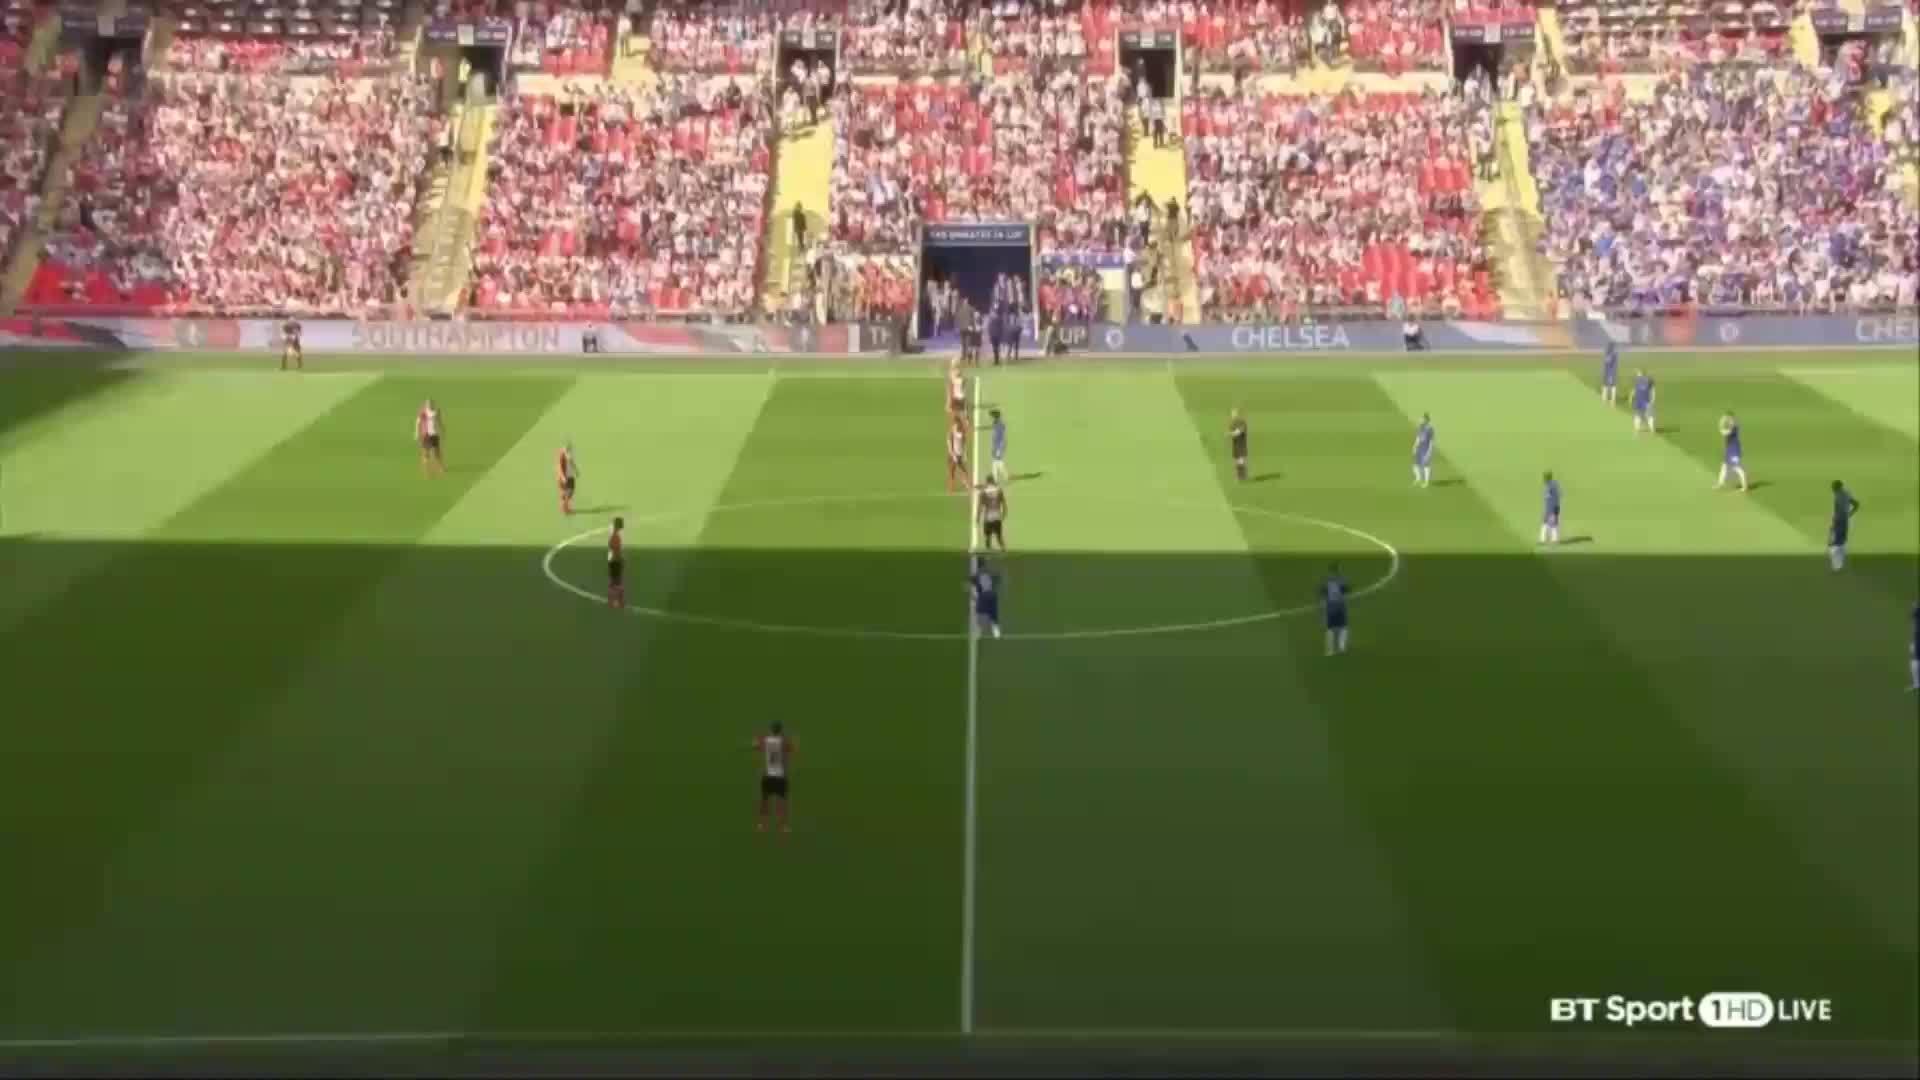 Chelsea 2-0 Southampton